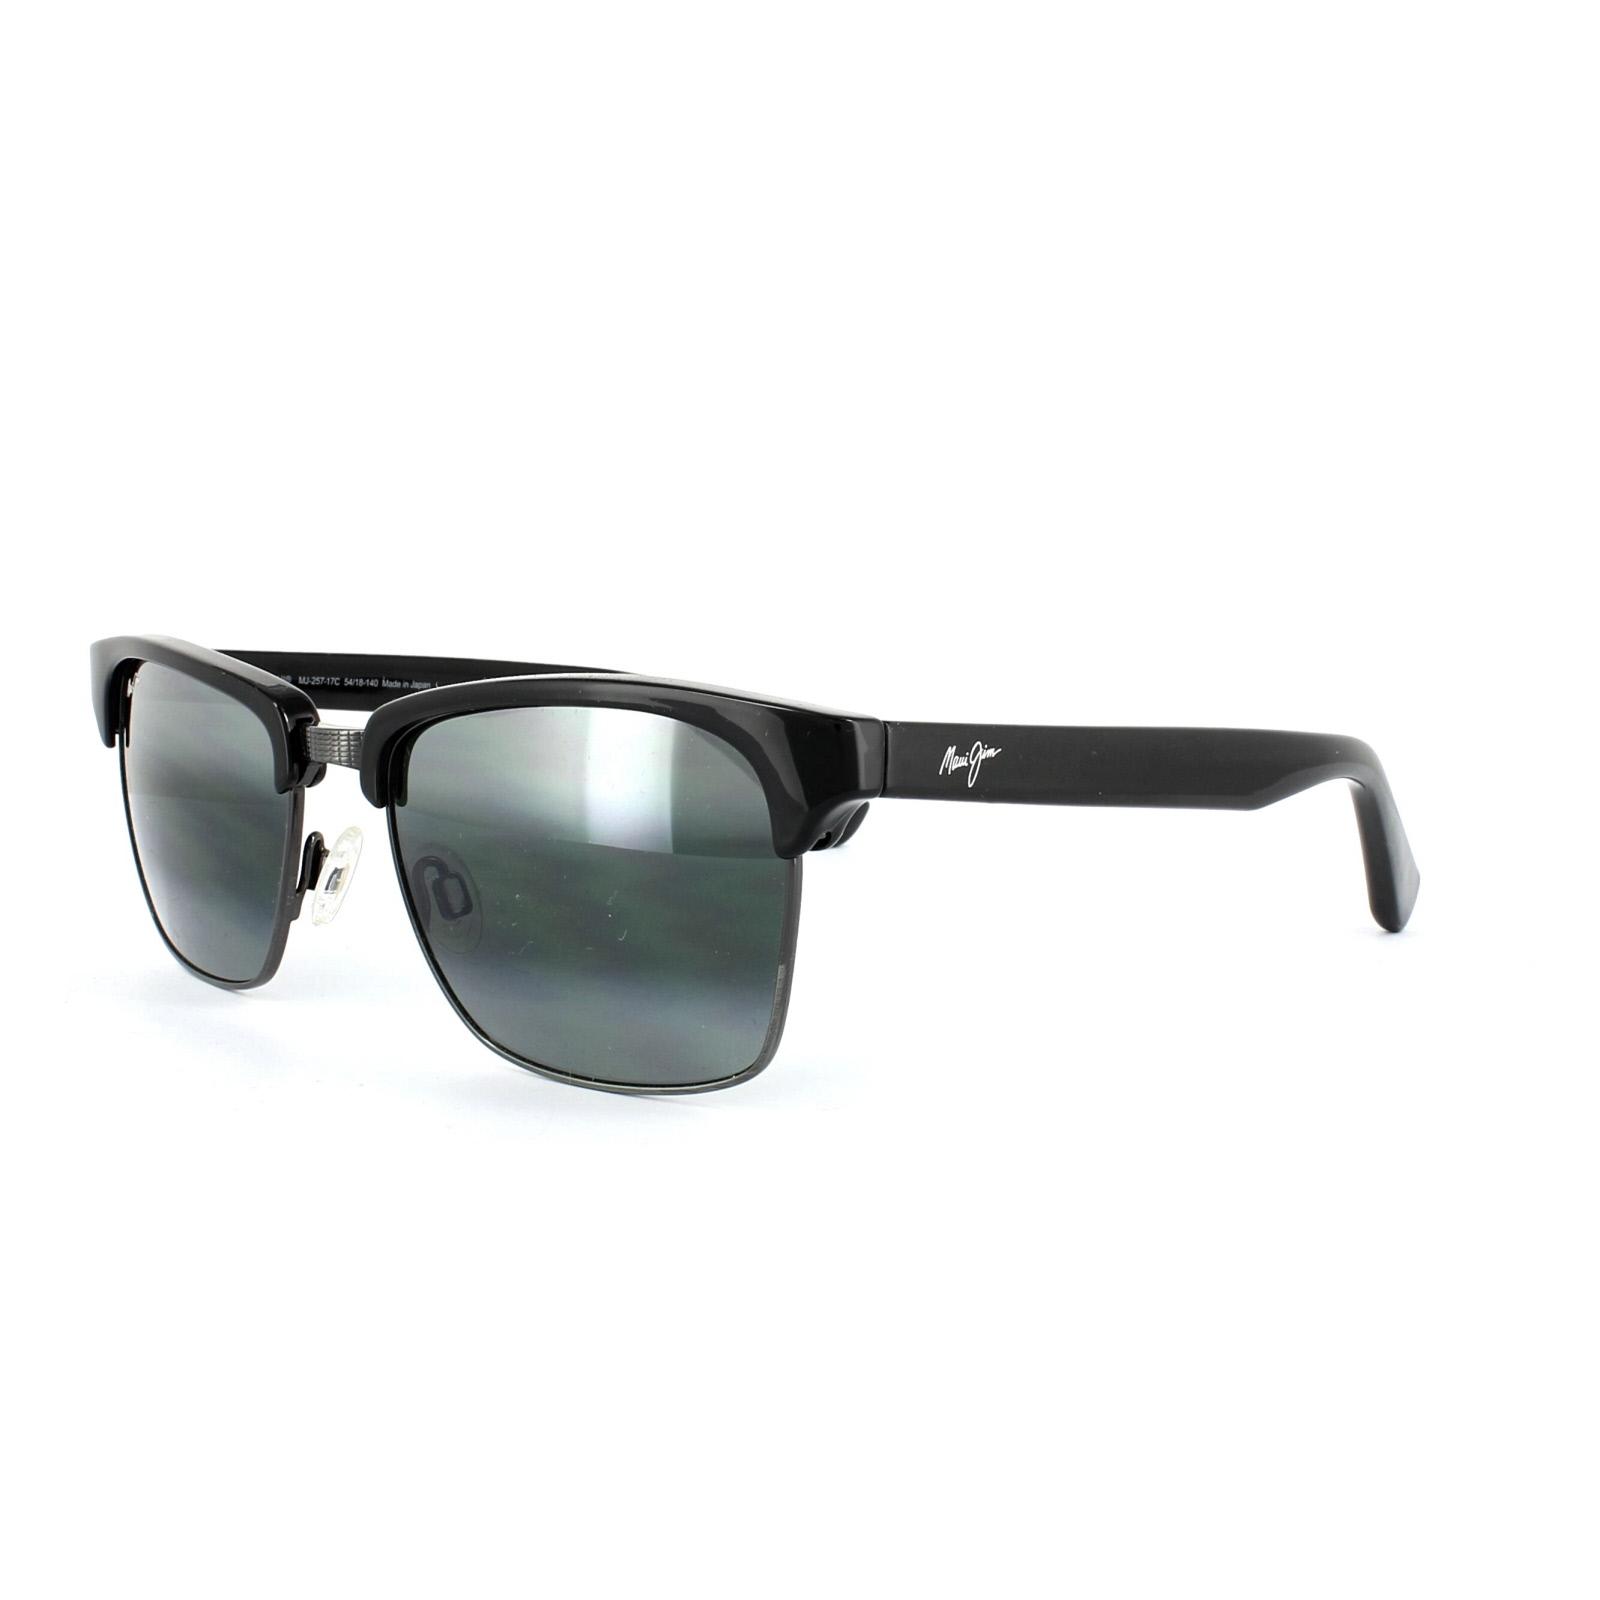 ecb7adf50ac Details about Maui Jim Sunglasses Kawika 257-17C Black Gloss Pewter Neutral  Grey Polarized